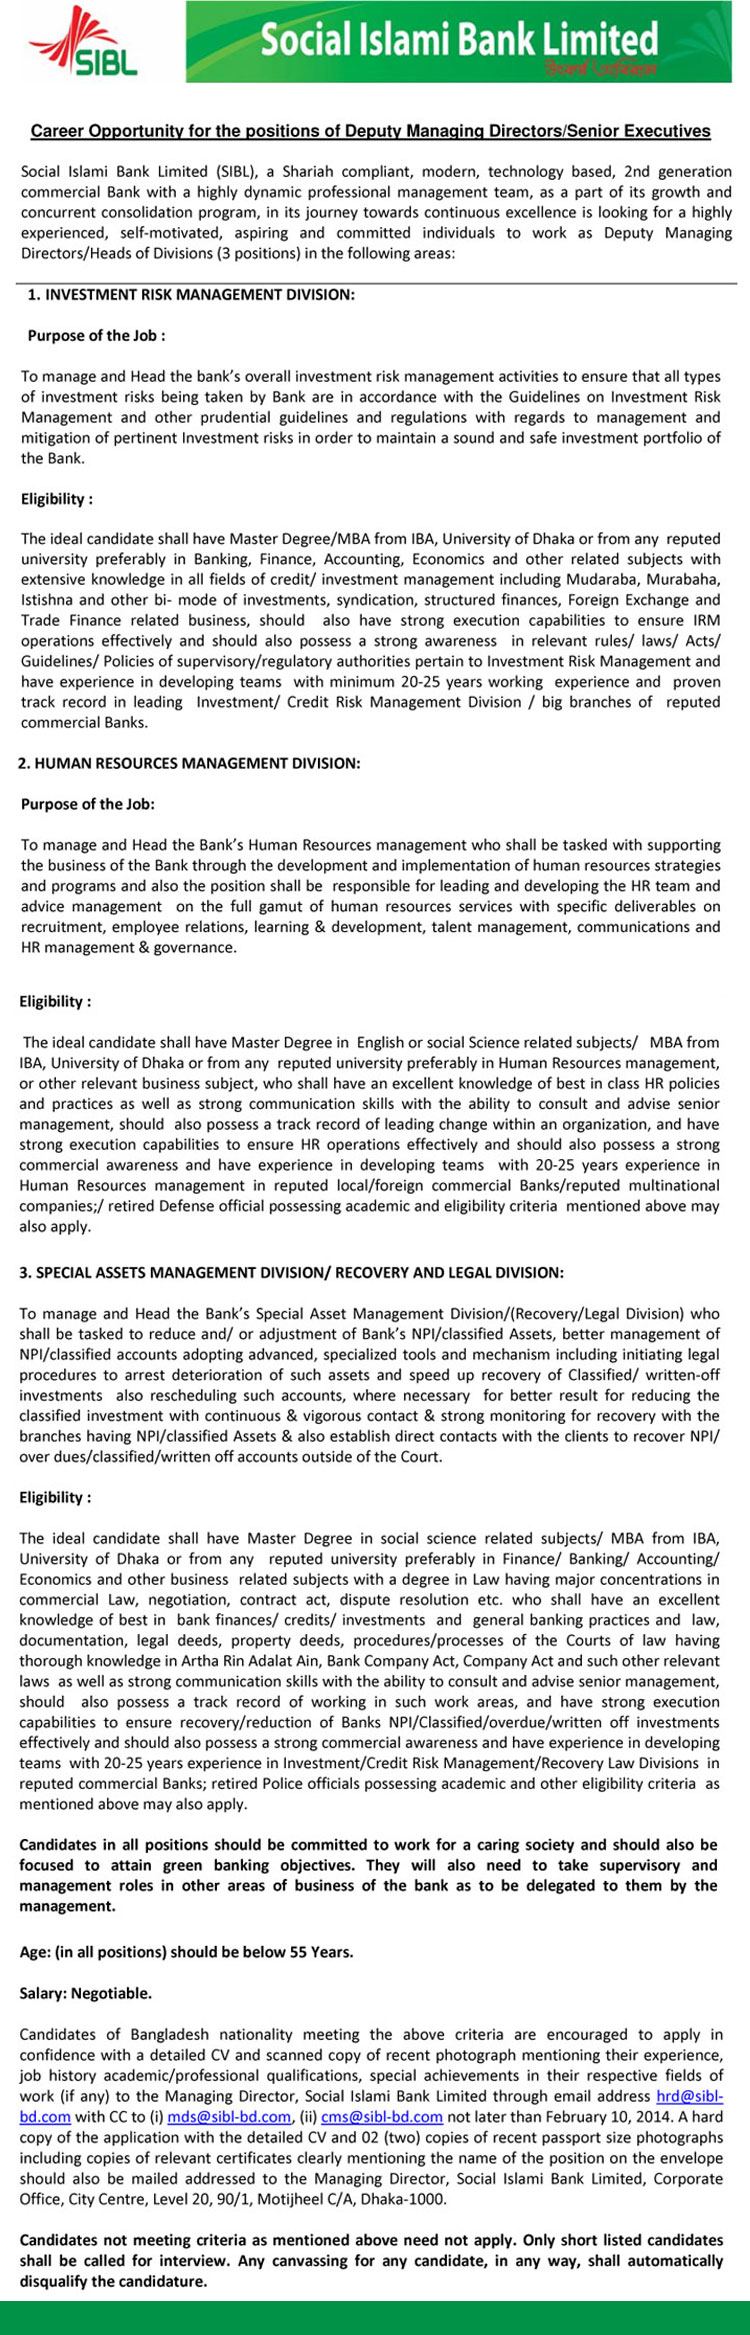 SIBL Deputy Managing Directors & Senior Excuitives Job Circular 2014